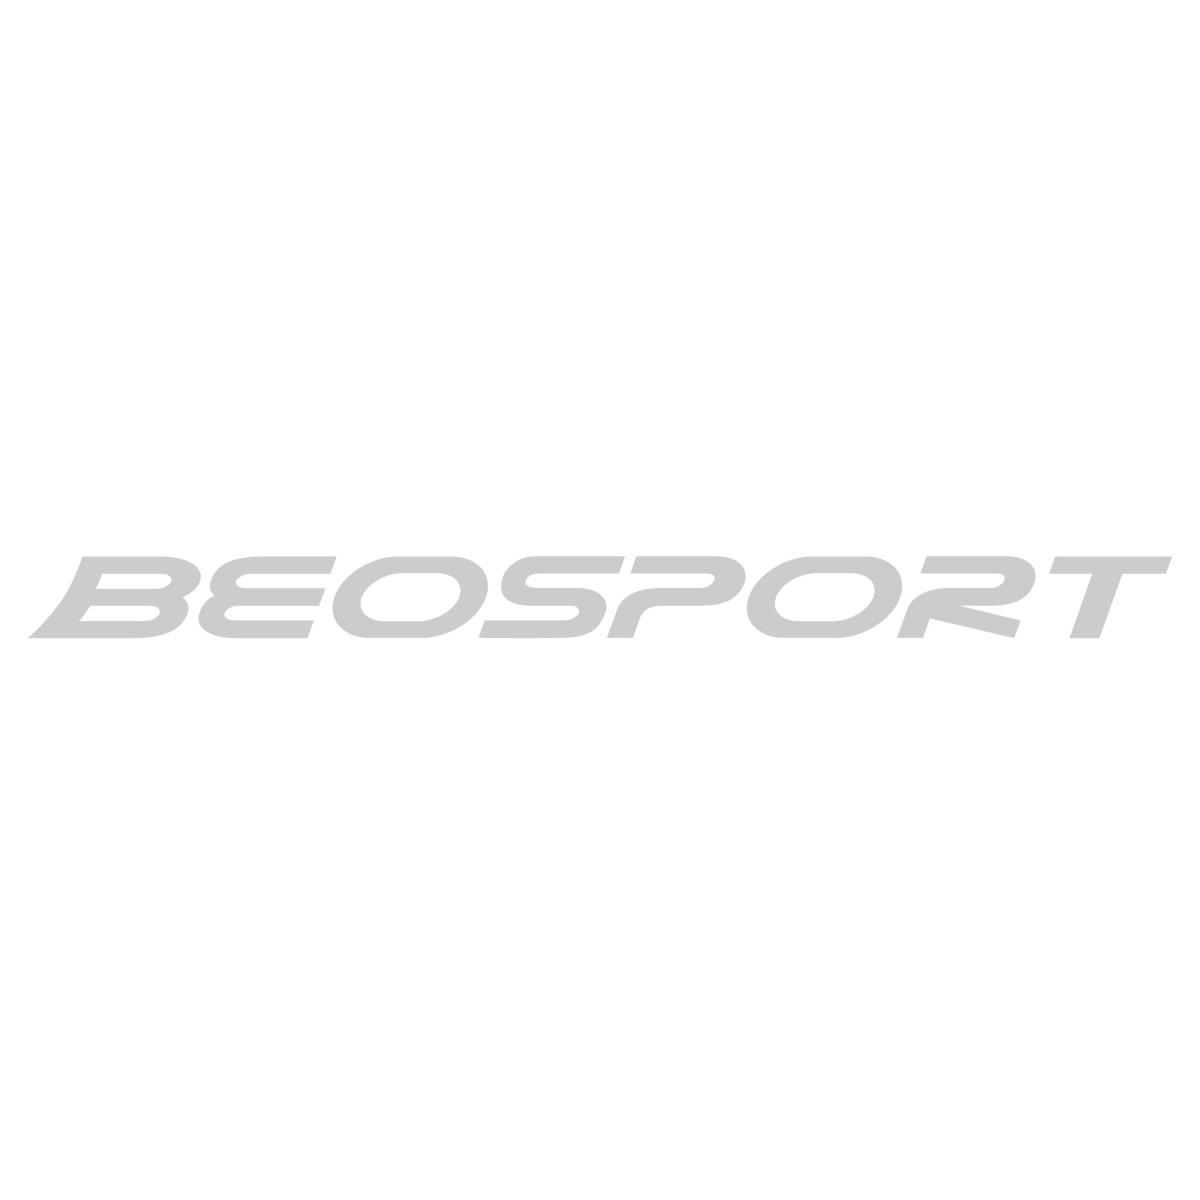 Wilson Element 1.25mm x 200m žice za rekete